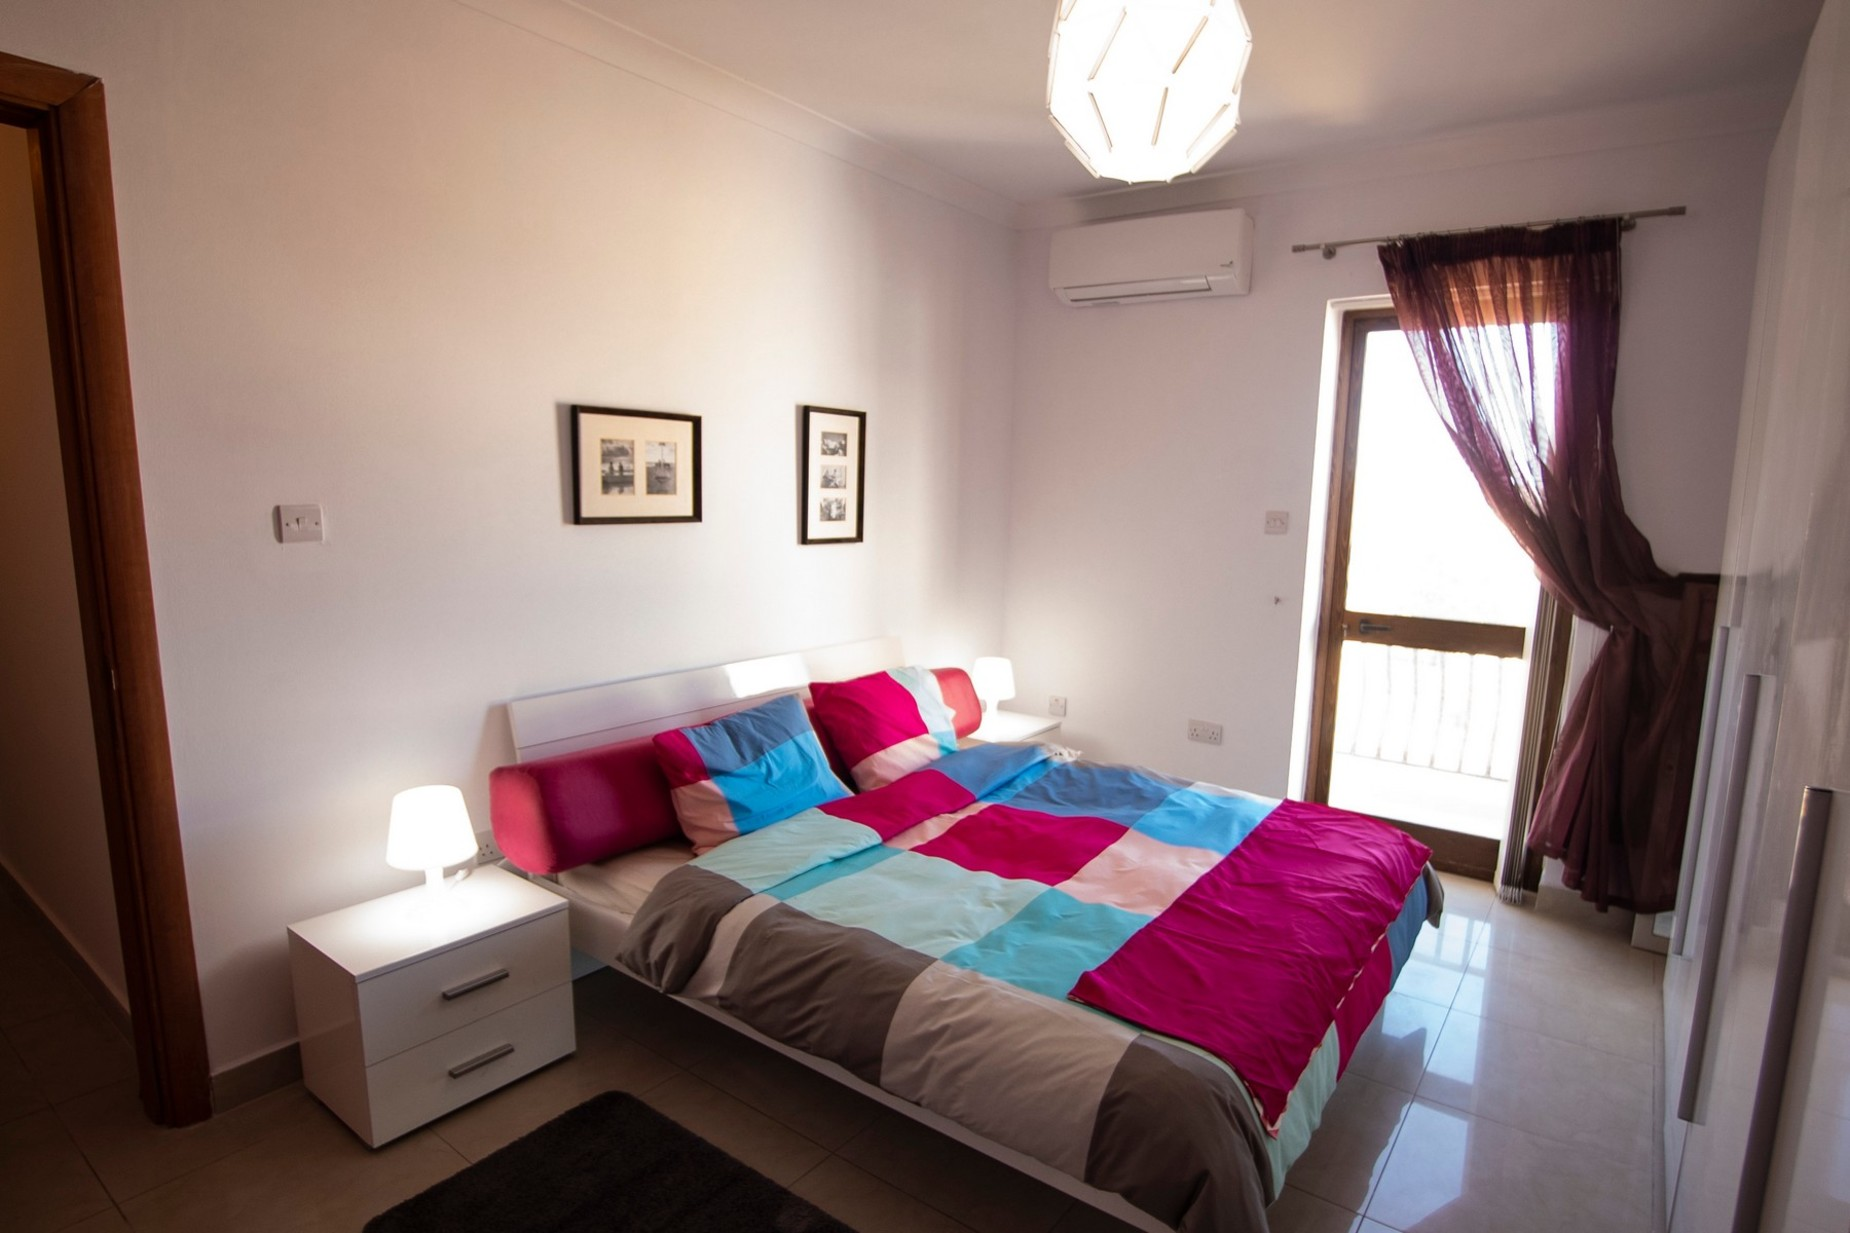 4 bed Apartment For Rent in Naxxar, Naxxar - thumb 8